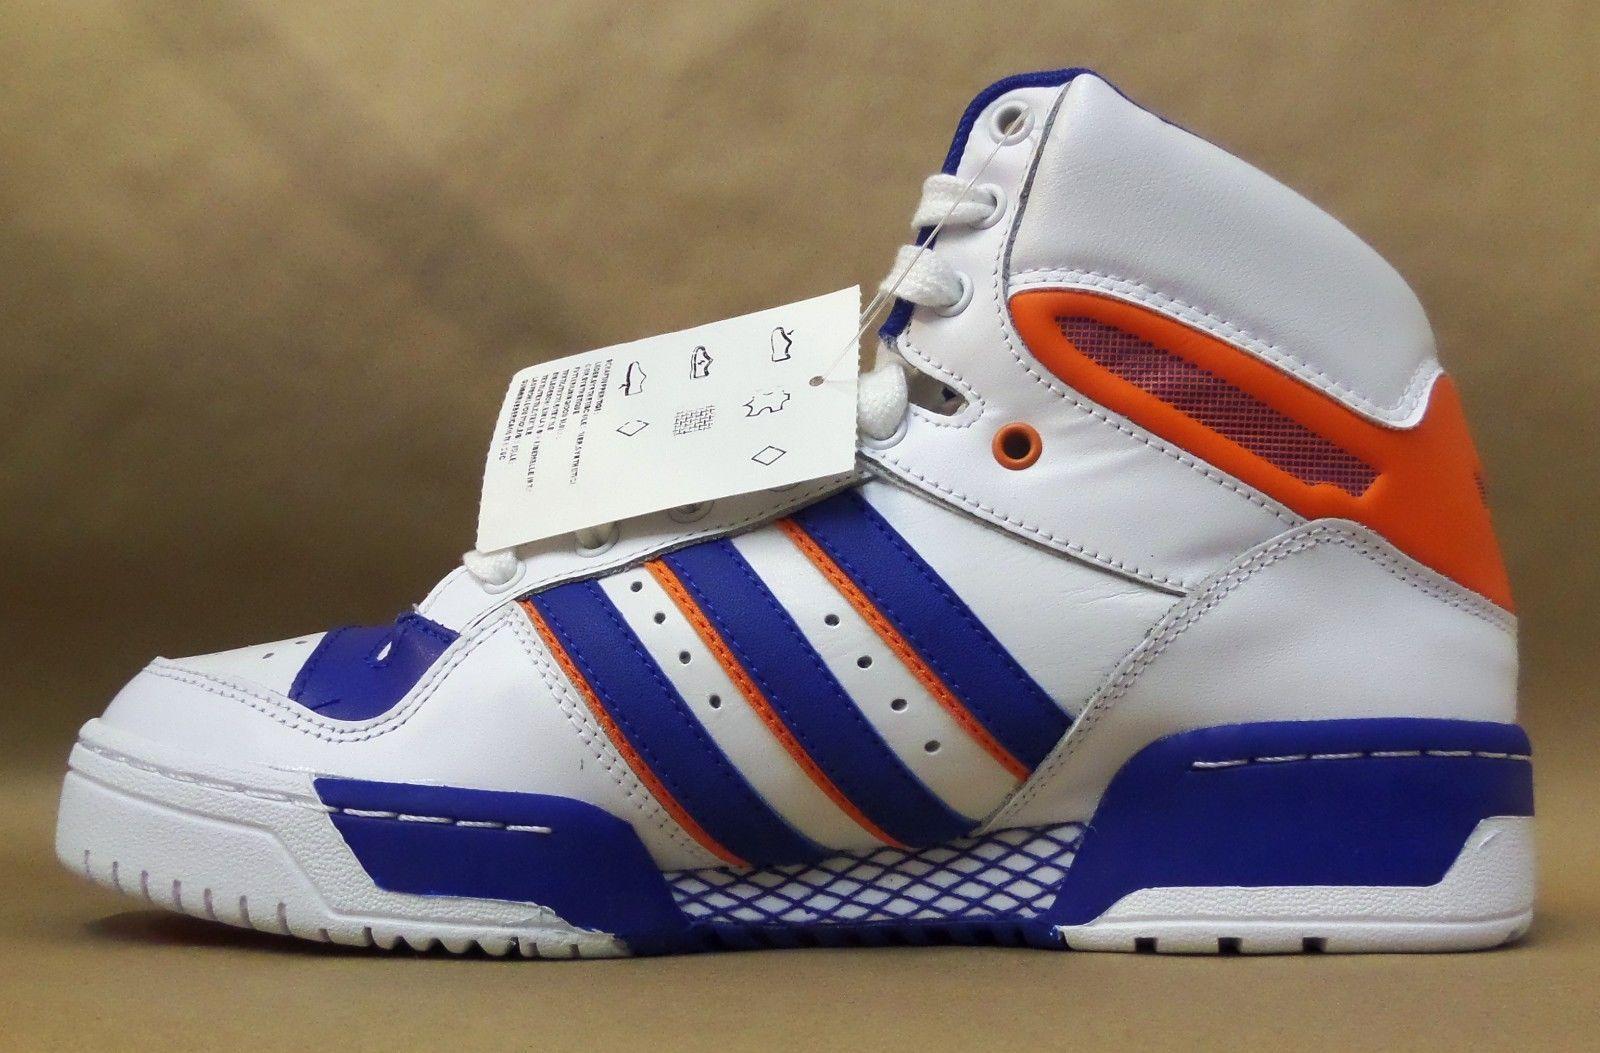 d219ccbf236801 Details about Adidas Metro Attitude Xeno Men's Hi-Cut Sneakers ...